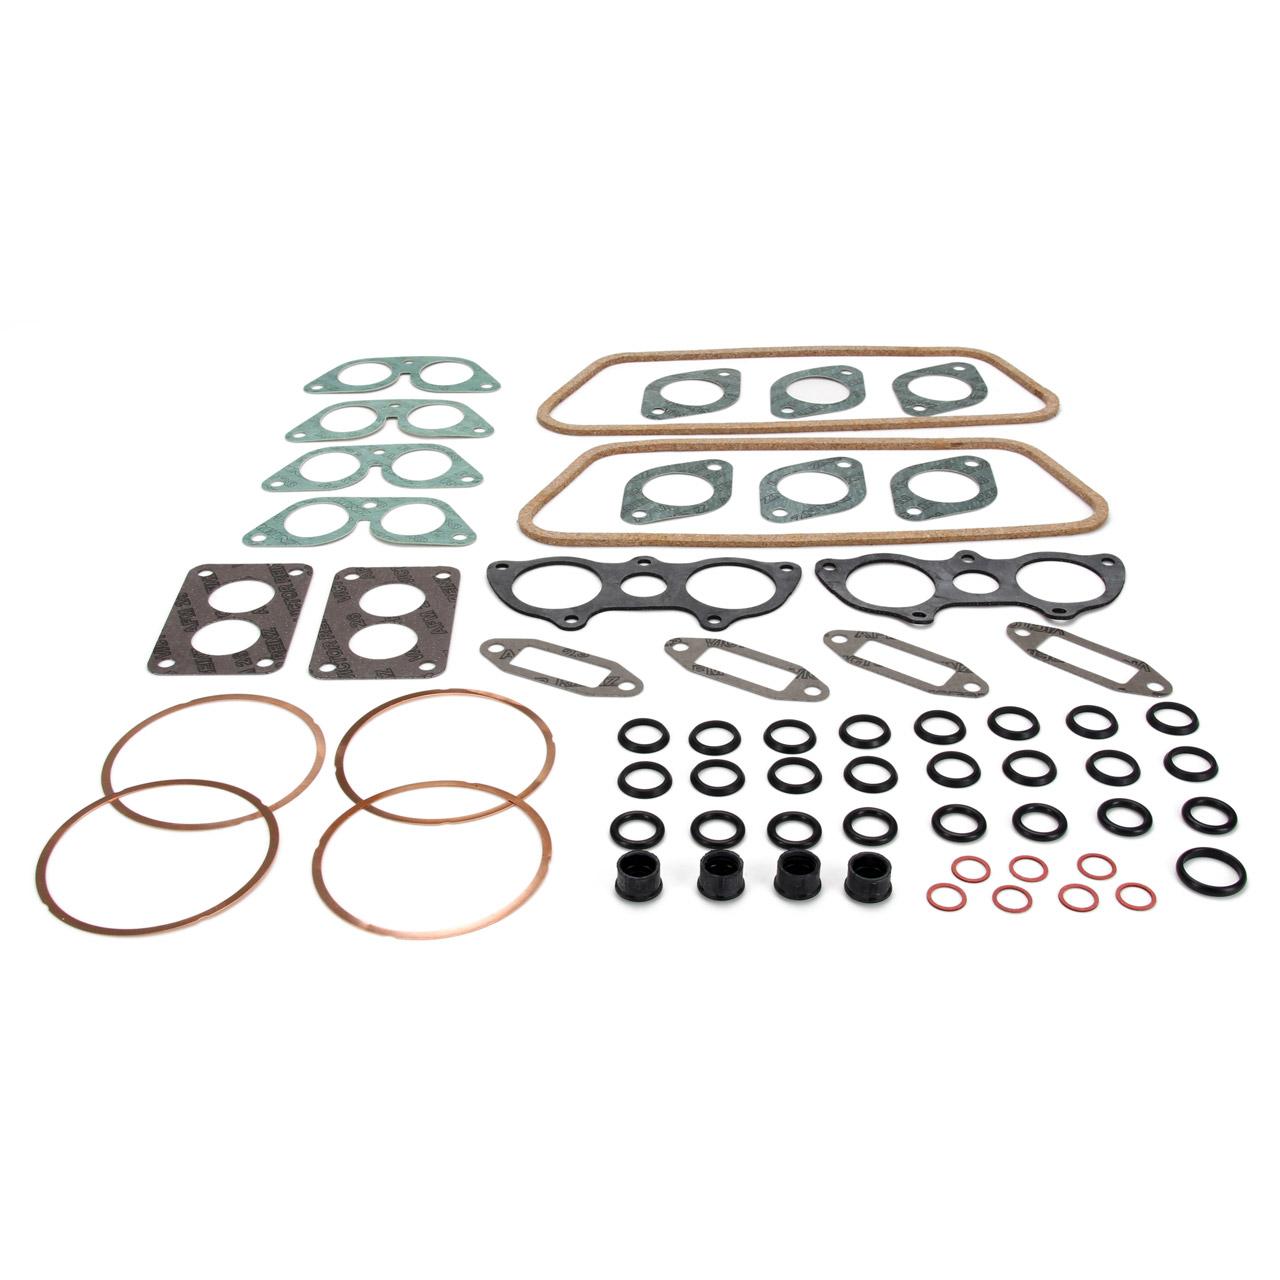 REINZ Motordichtsatz Zylinderkopfdichtung Satz PORSCHE 356 1100-1600 912 / Targa